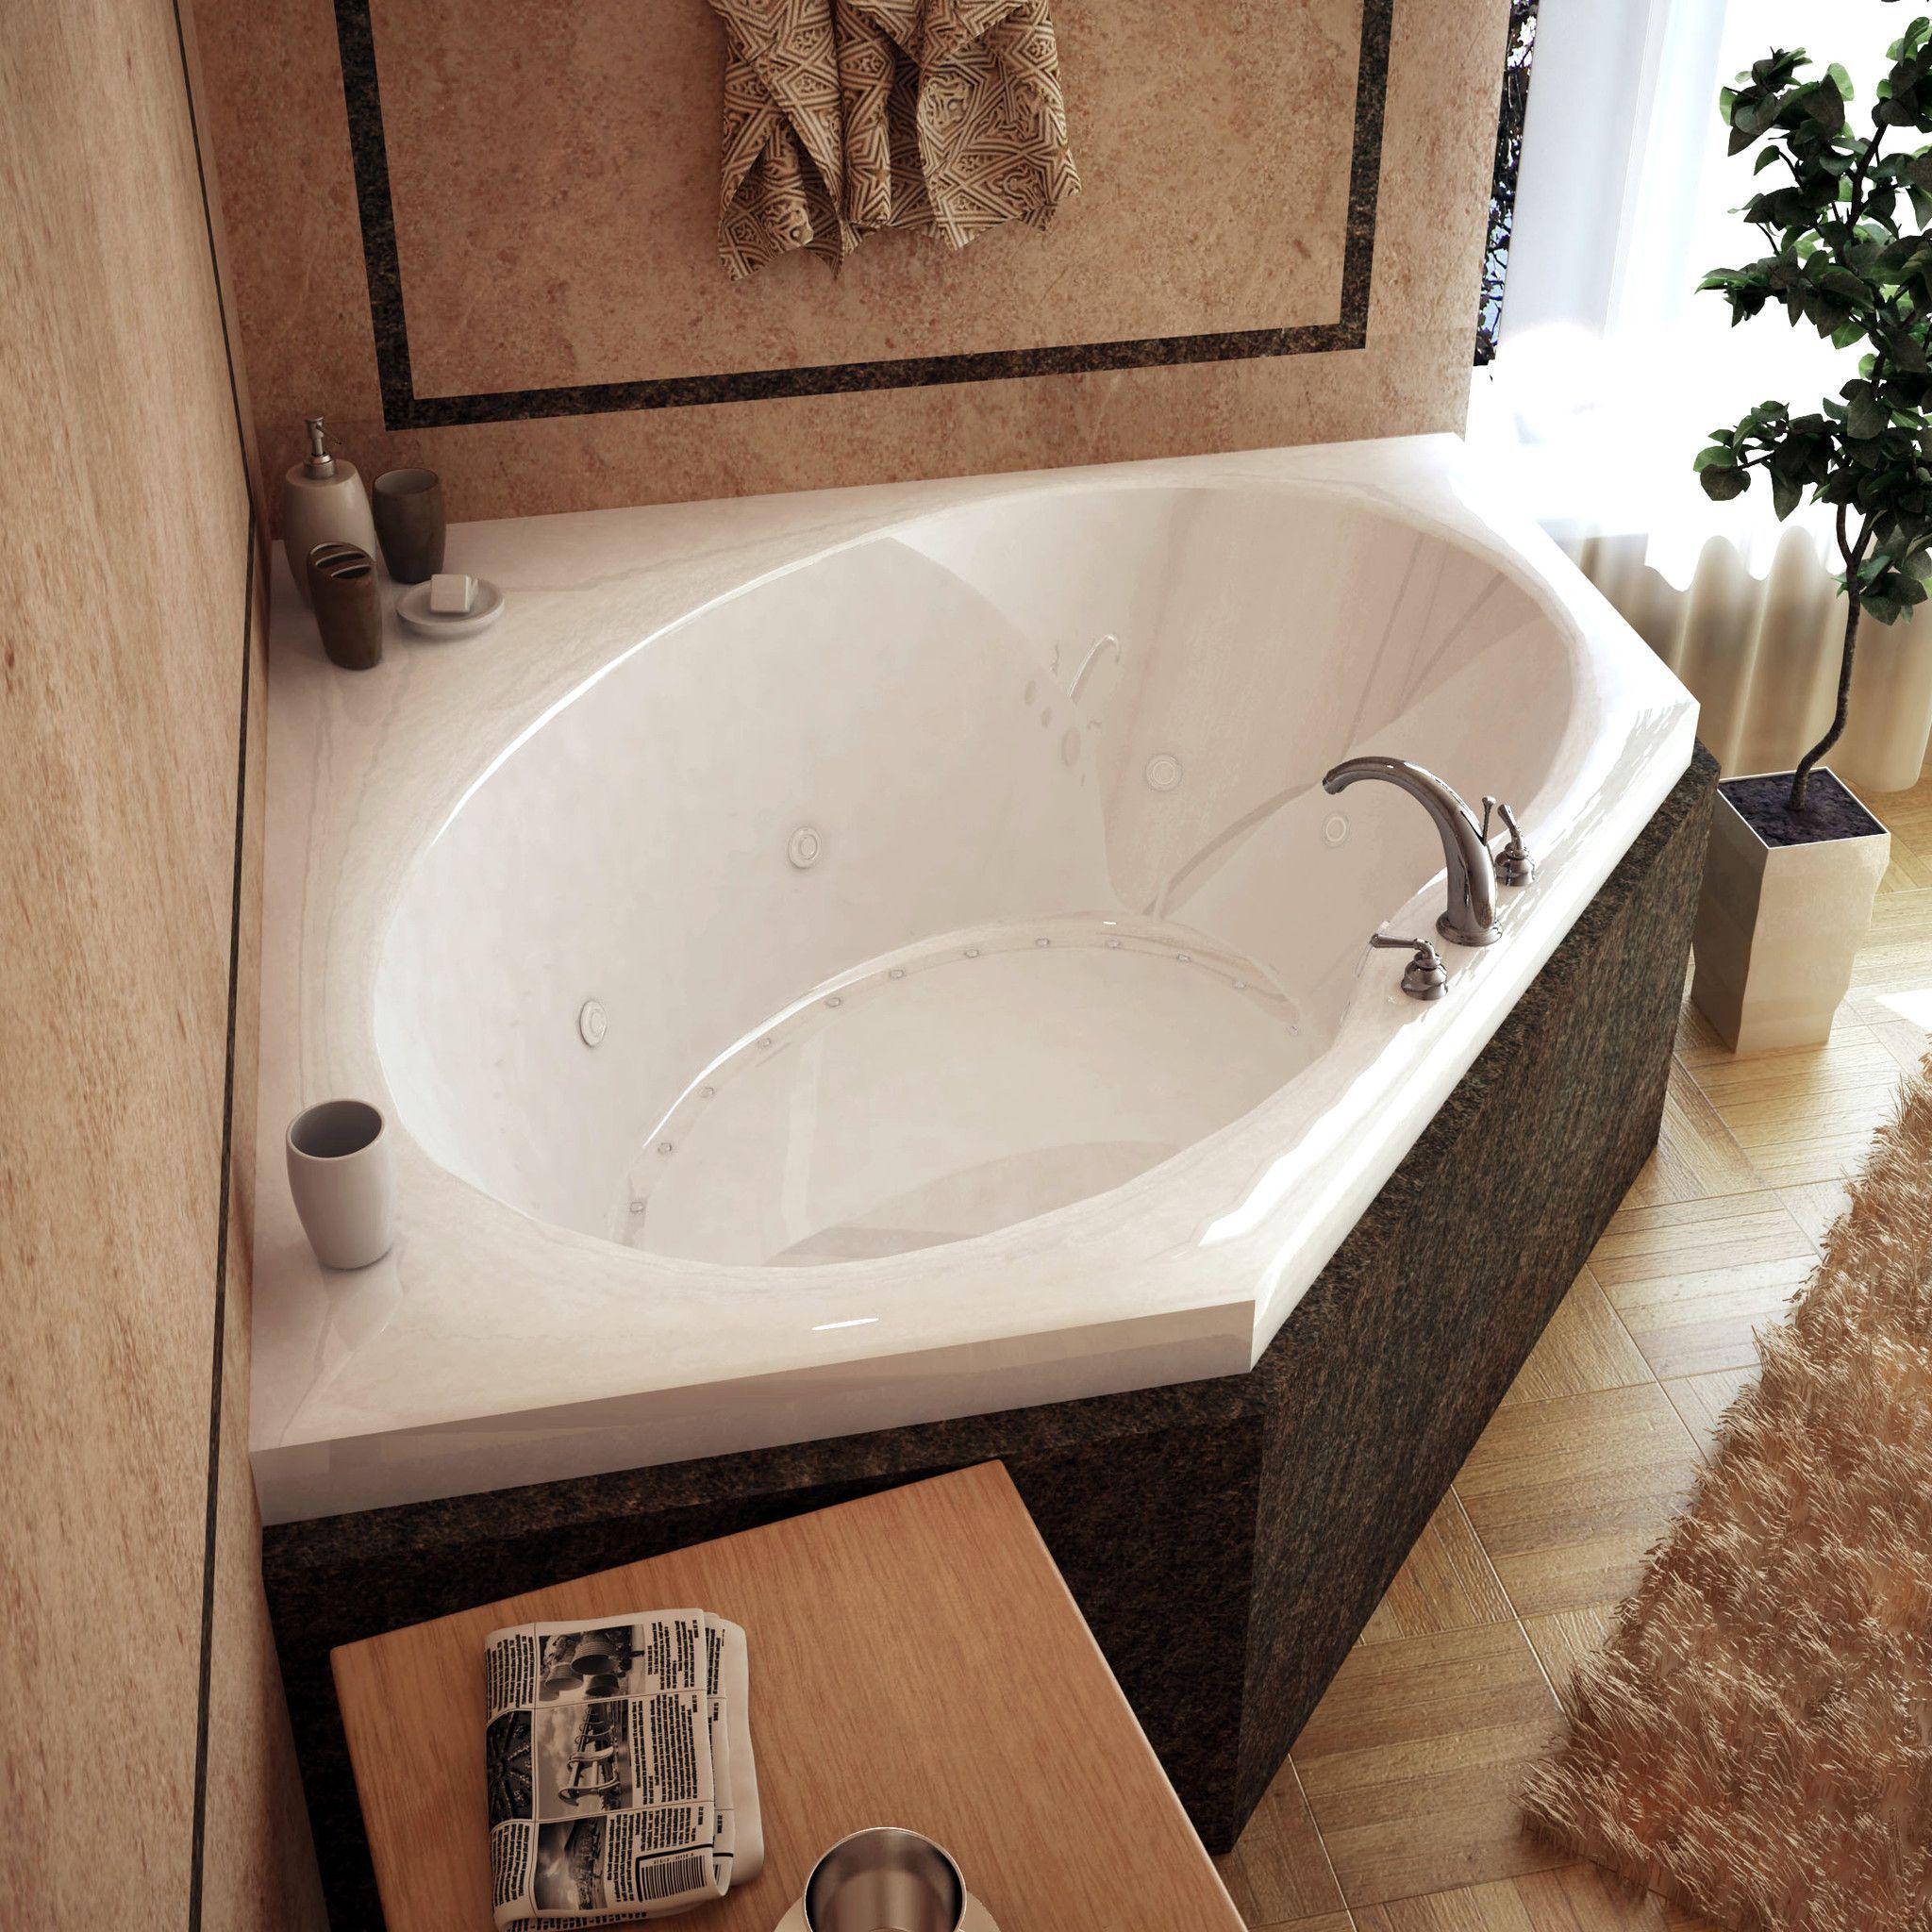 Atlantis Whirlpools 6060SAR Sublime 60 x 60 Corner Air Jetted Bathtub